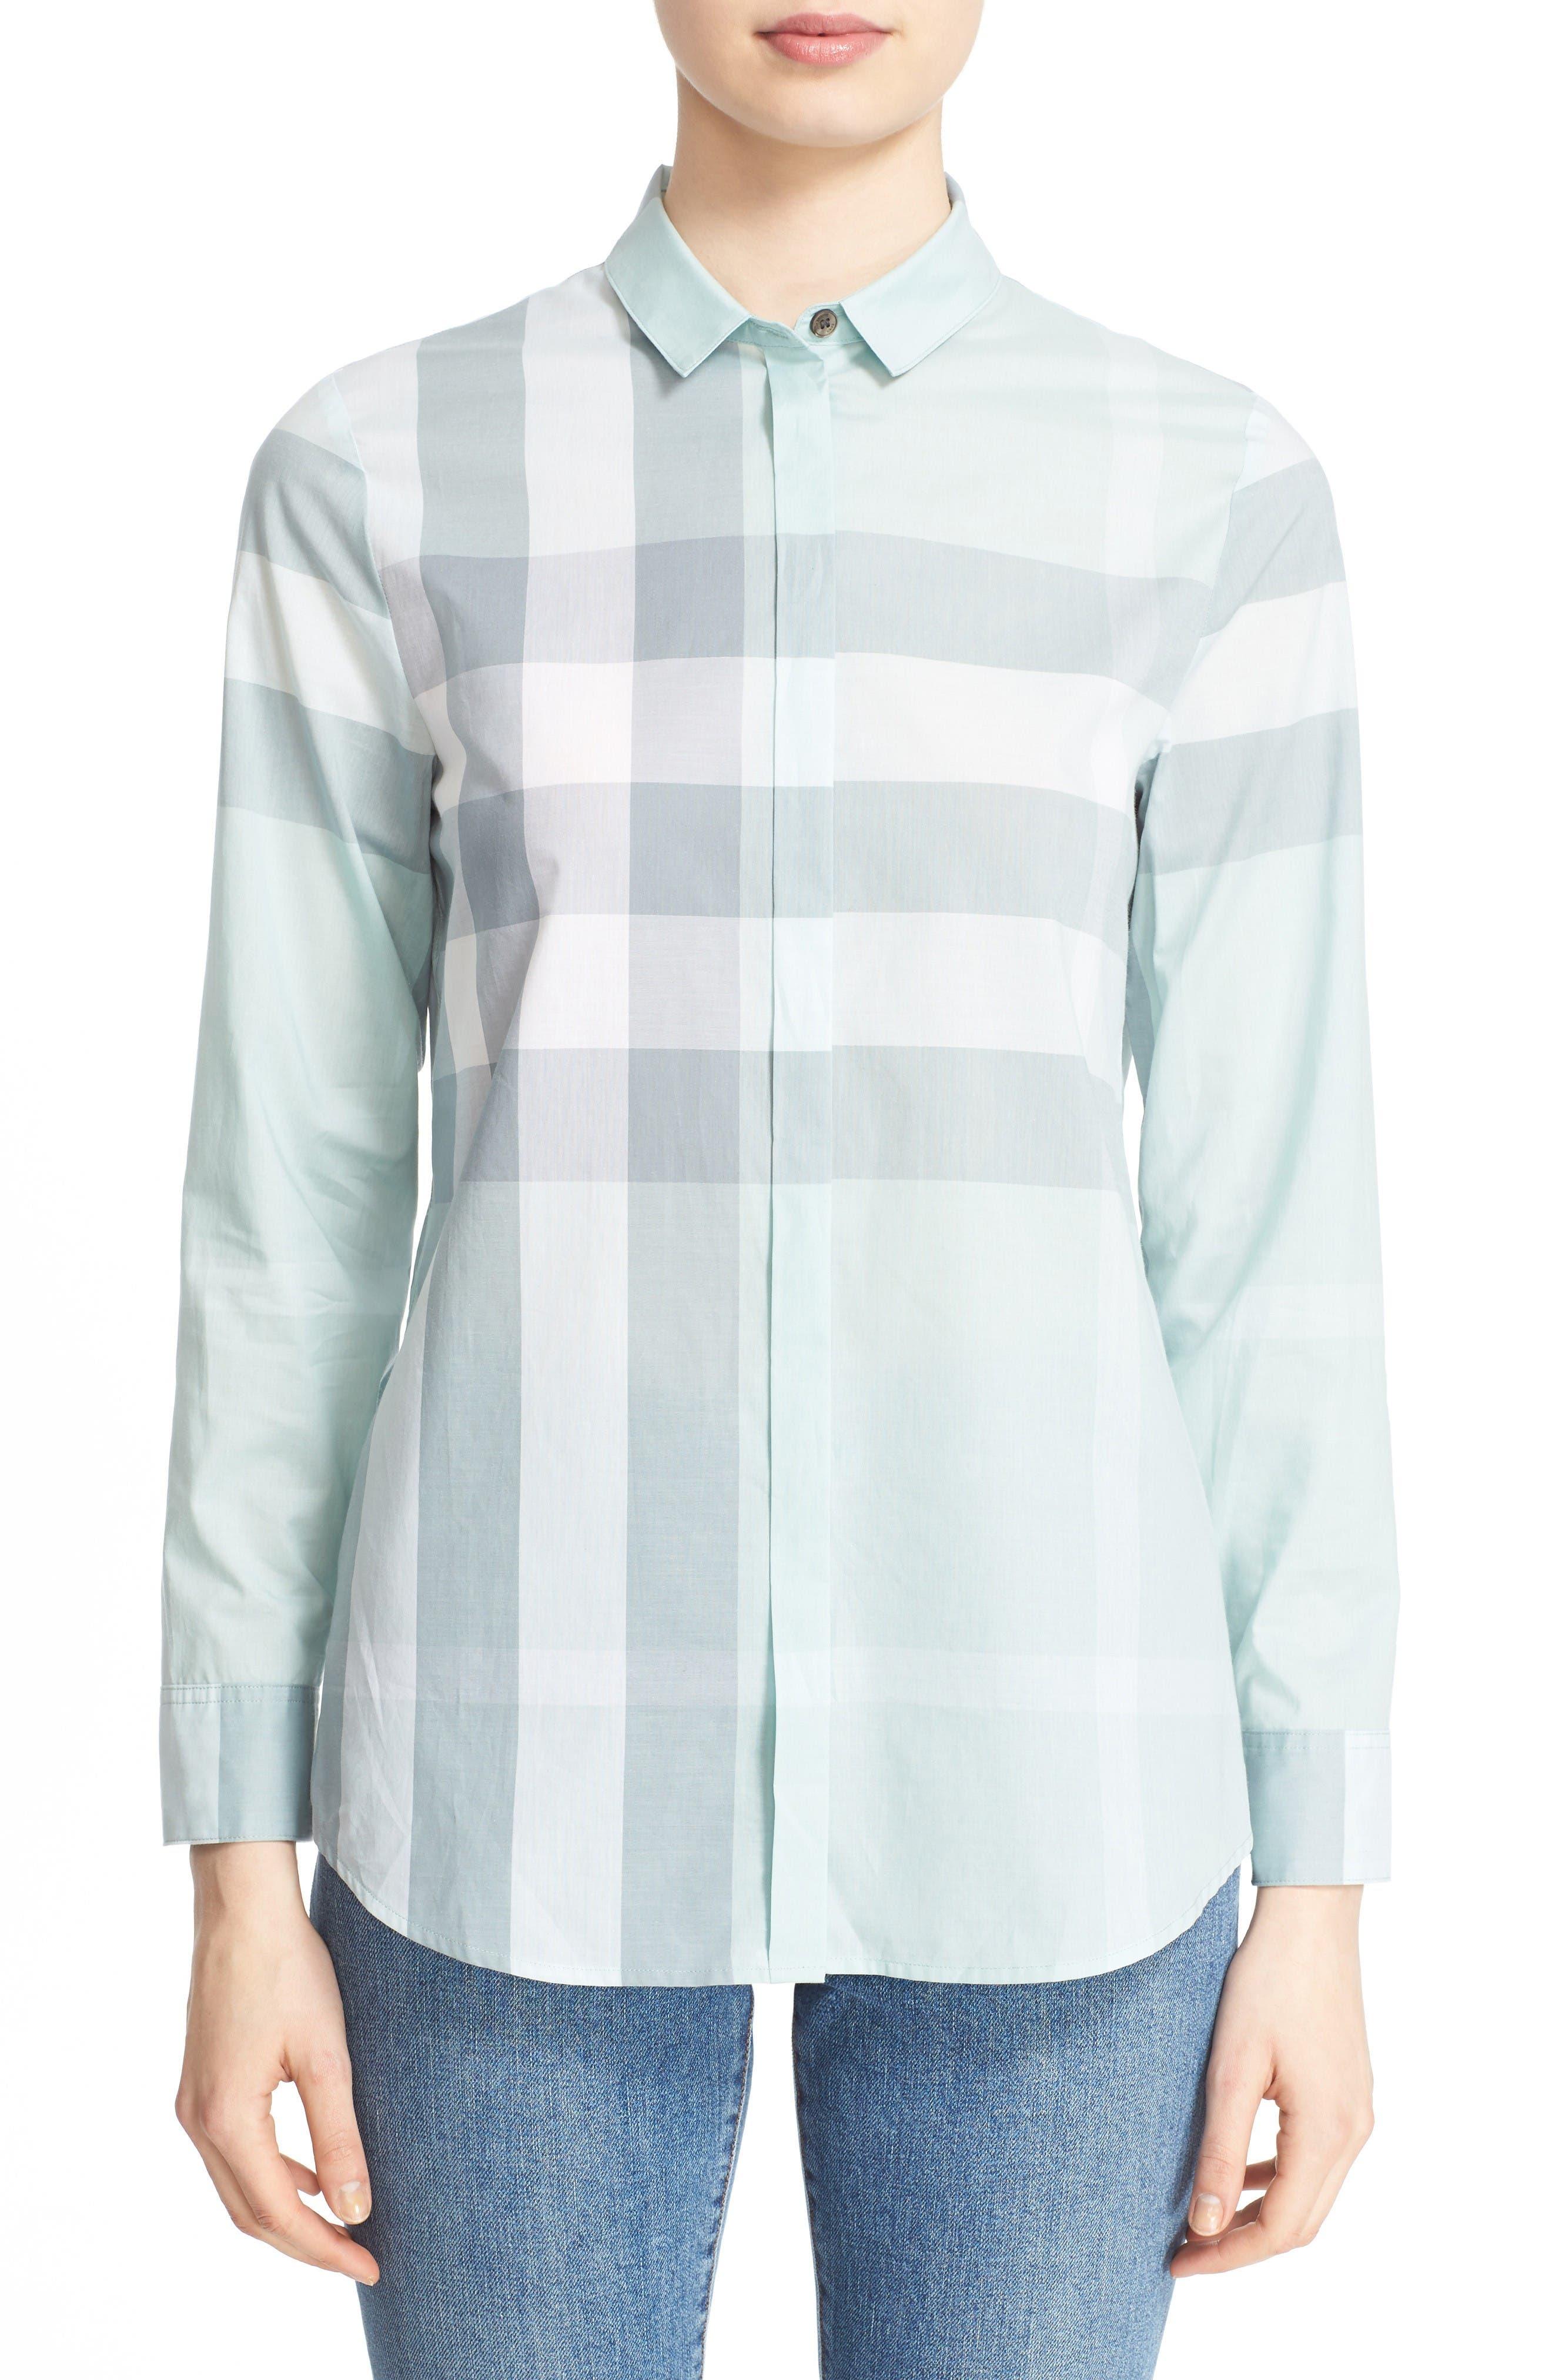 Alternate Image 1 Selected - Burberry Check Print Cotton Shirt